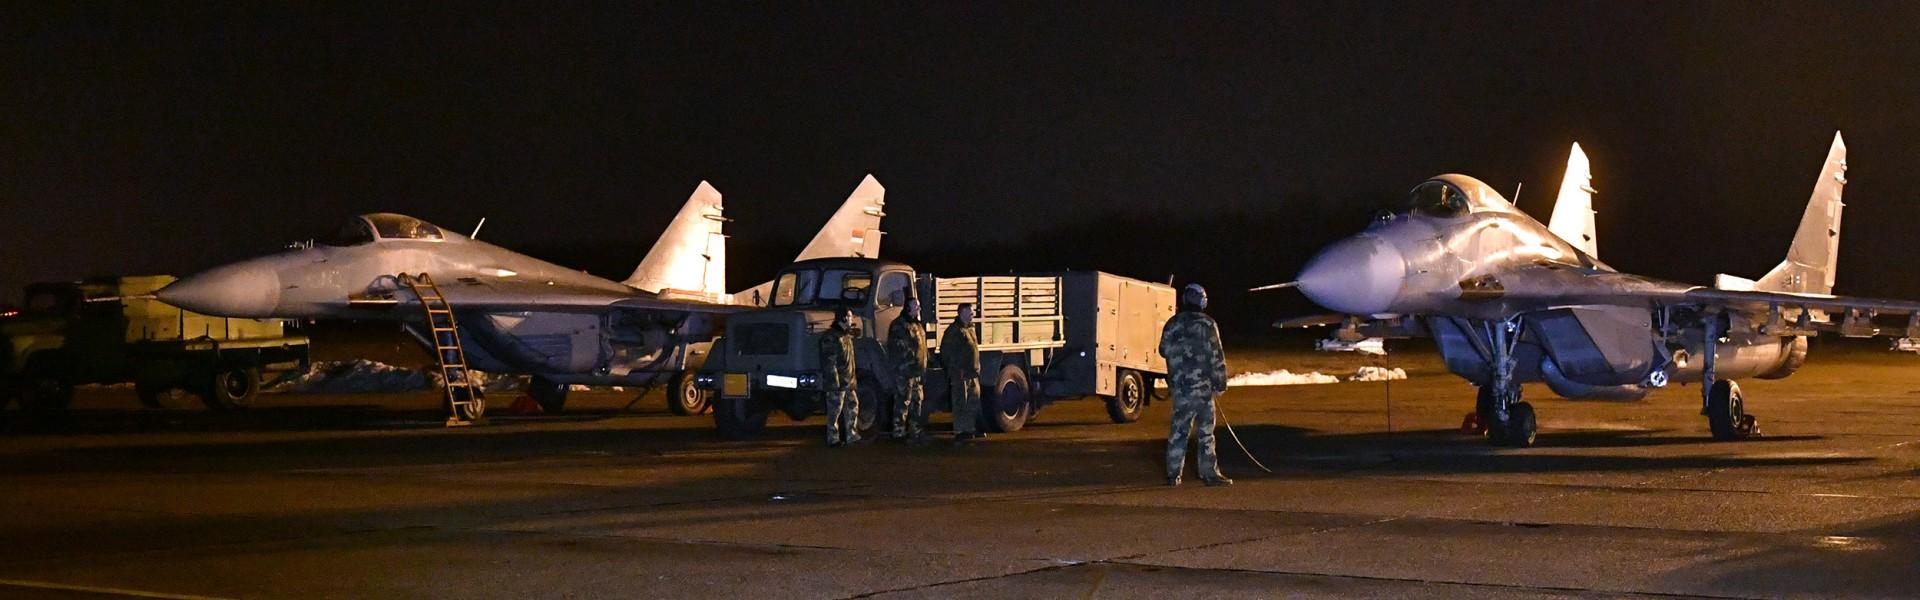 Наше слободно небо чуваће србски авиони и пилоти и србска противваздушна одбран